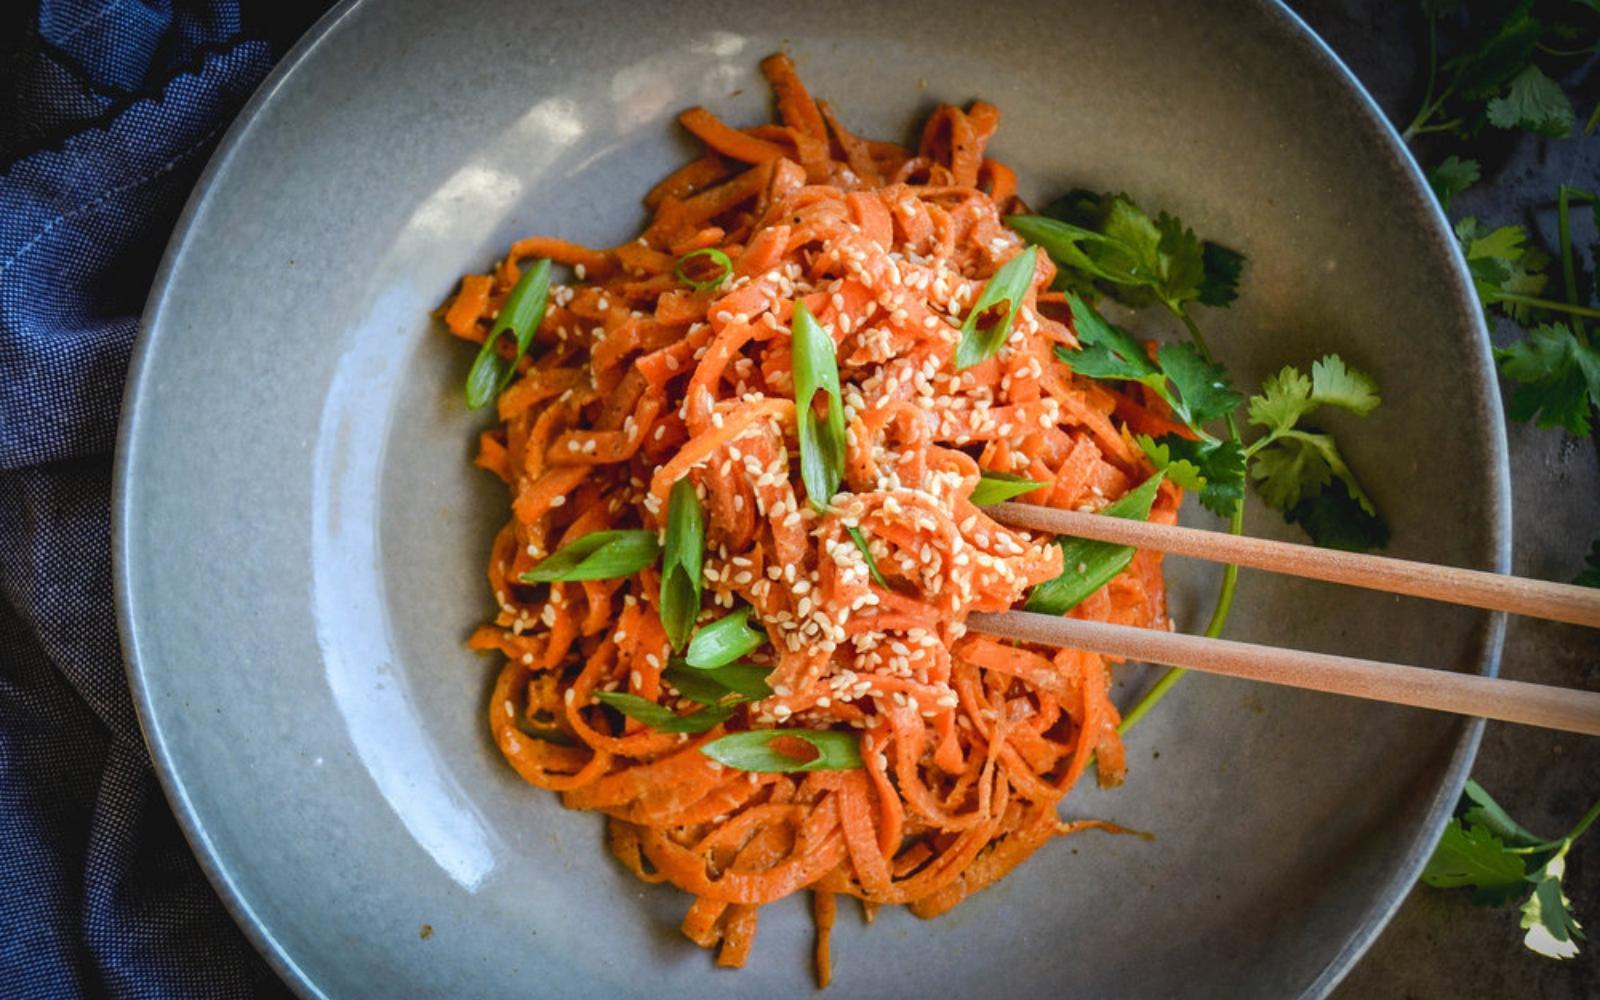 Vegan Gluten-Free Paleo Carrot Noodles With Almond Sesame Sauce